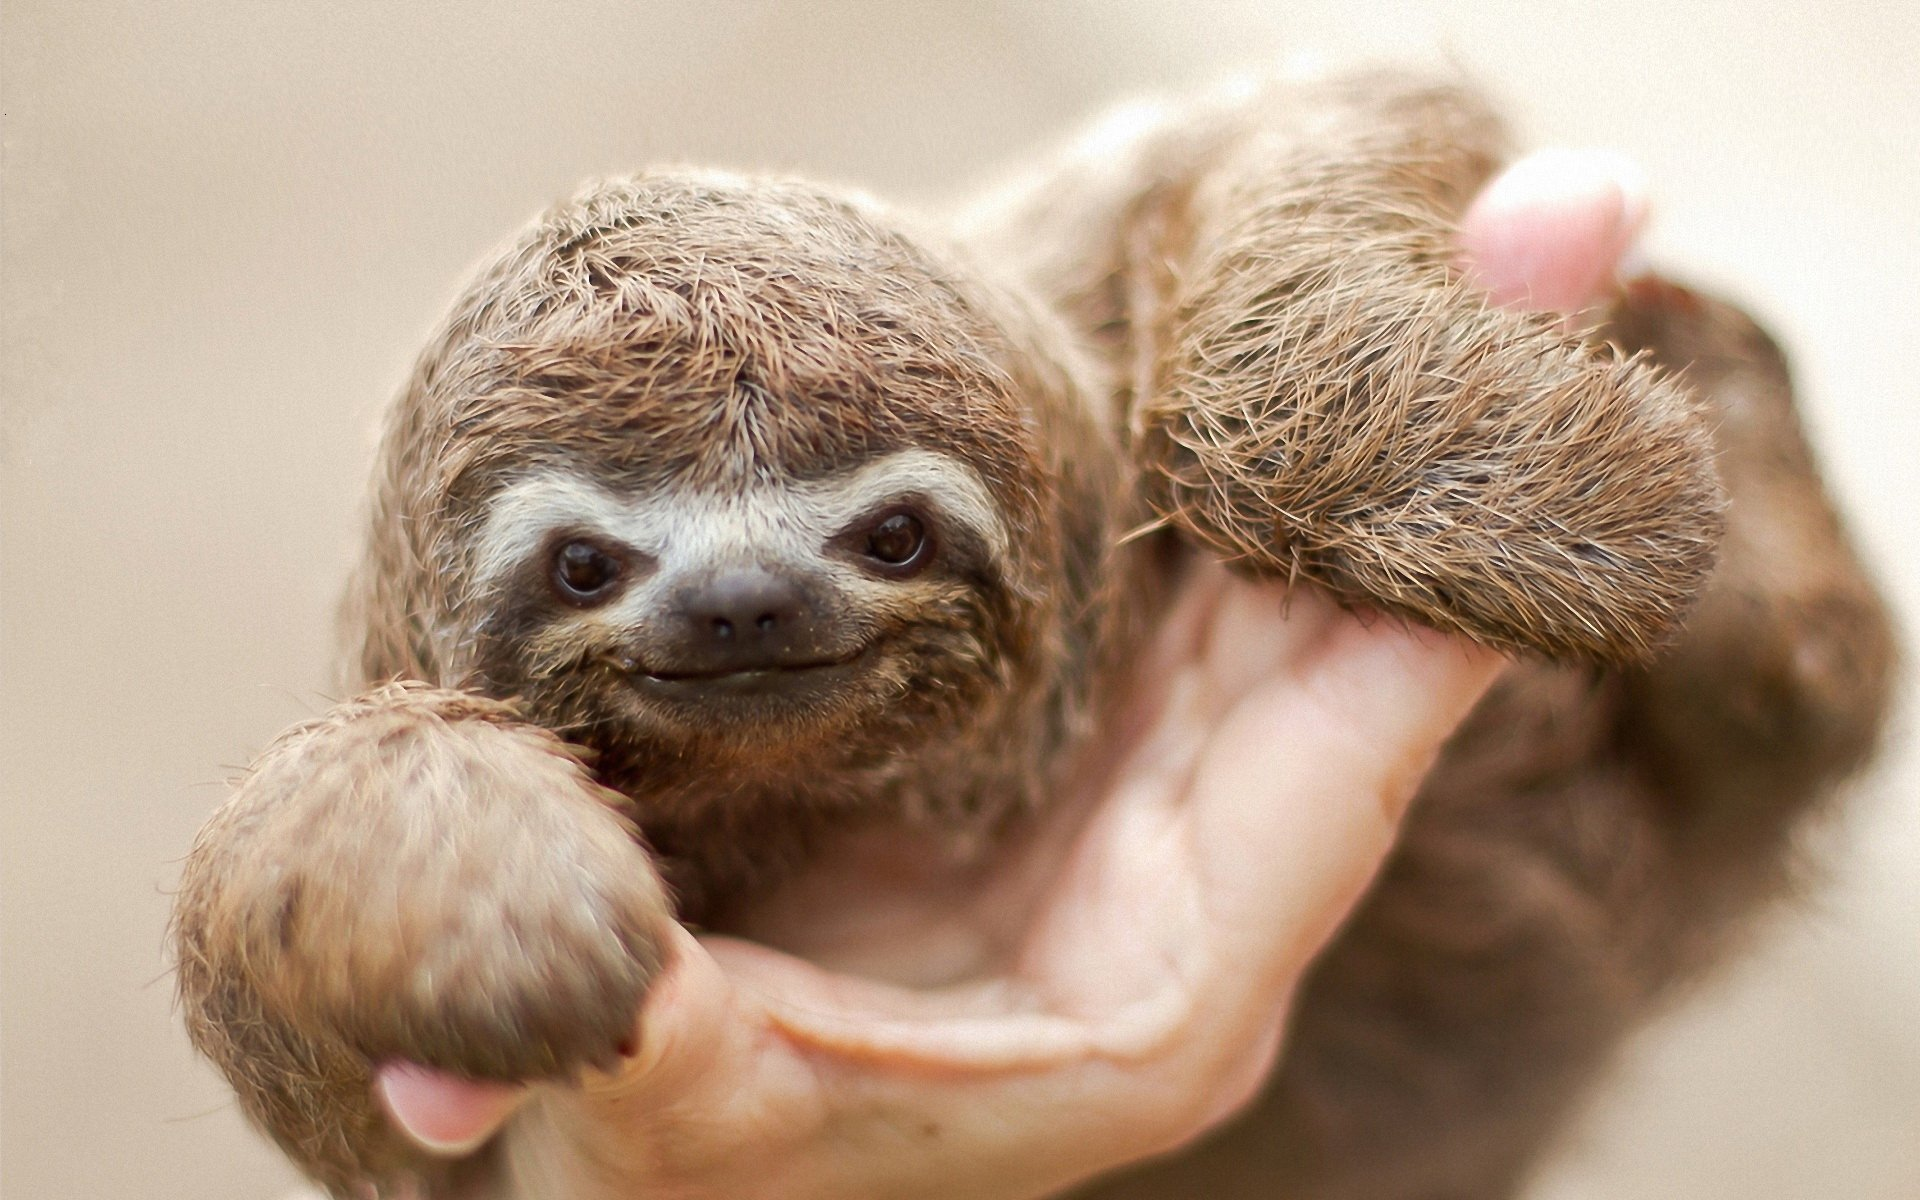 9 Sloth HD Wallpapers